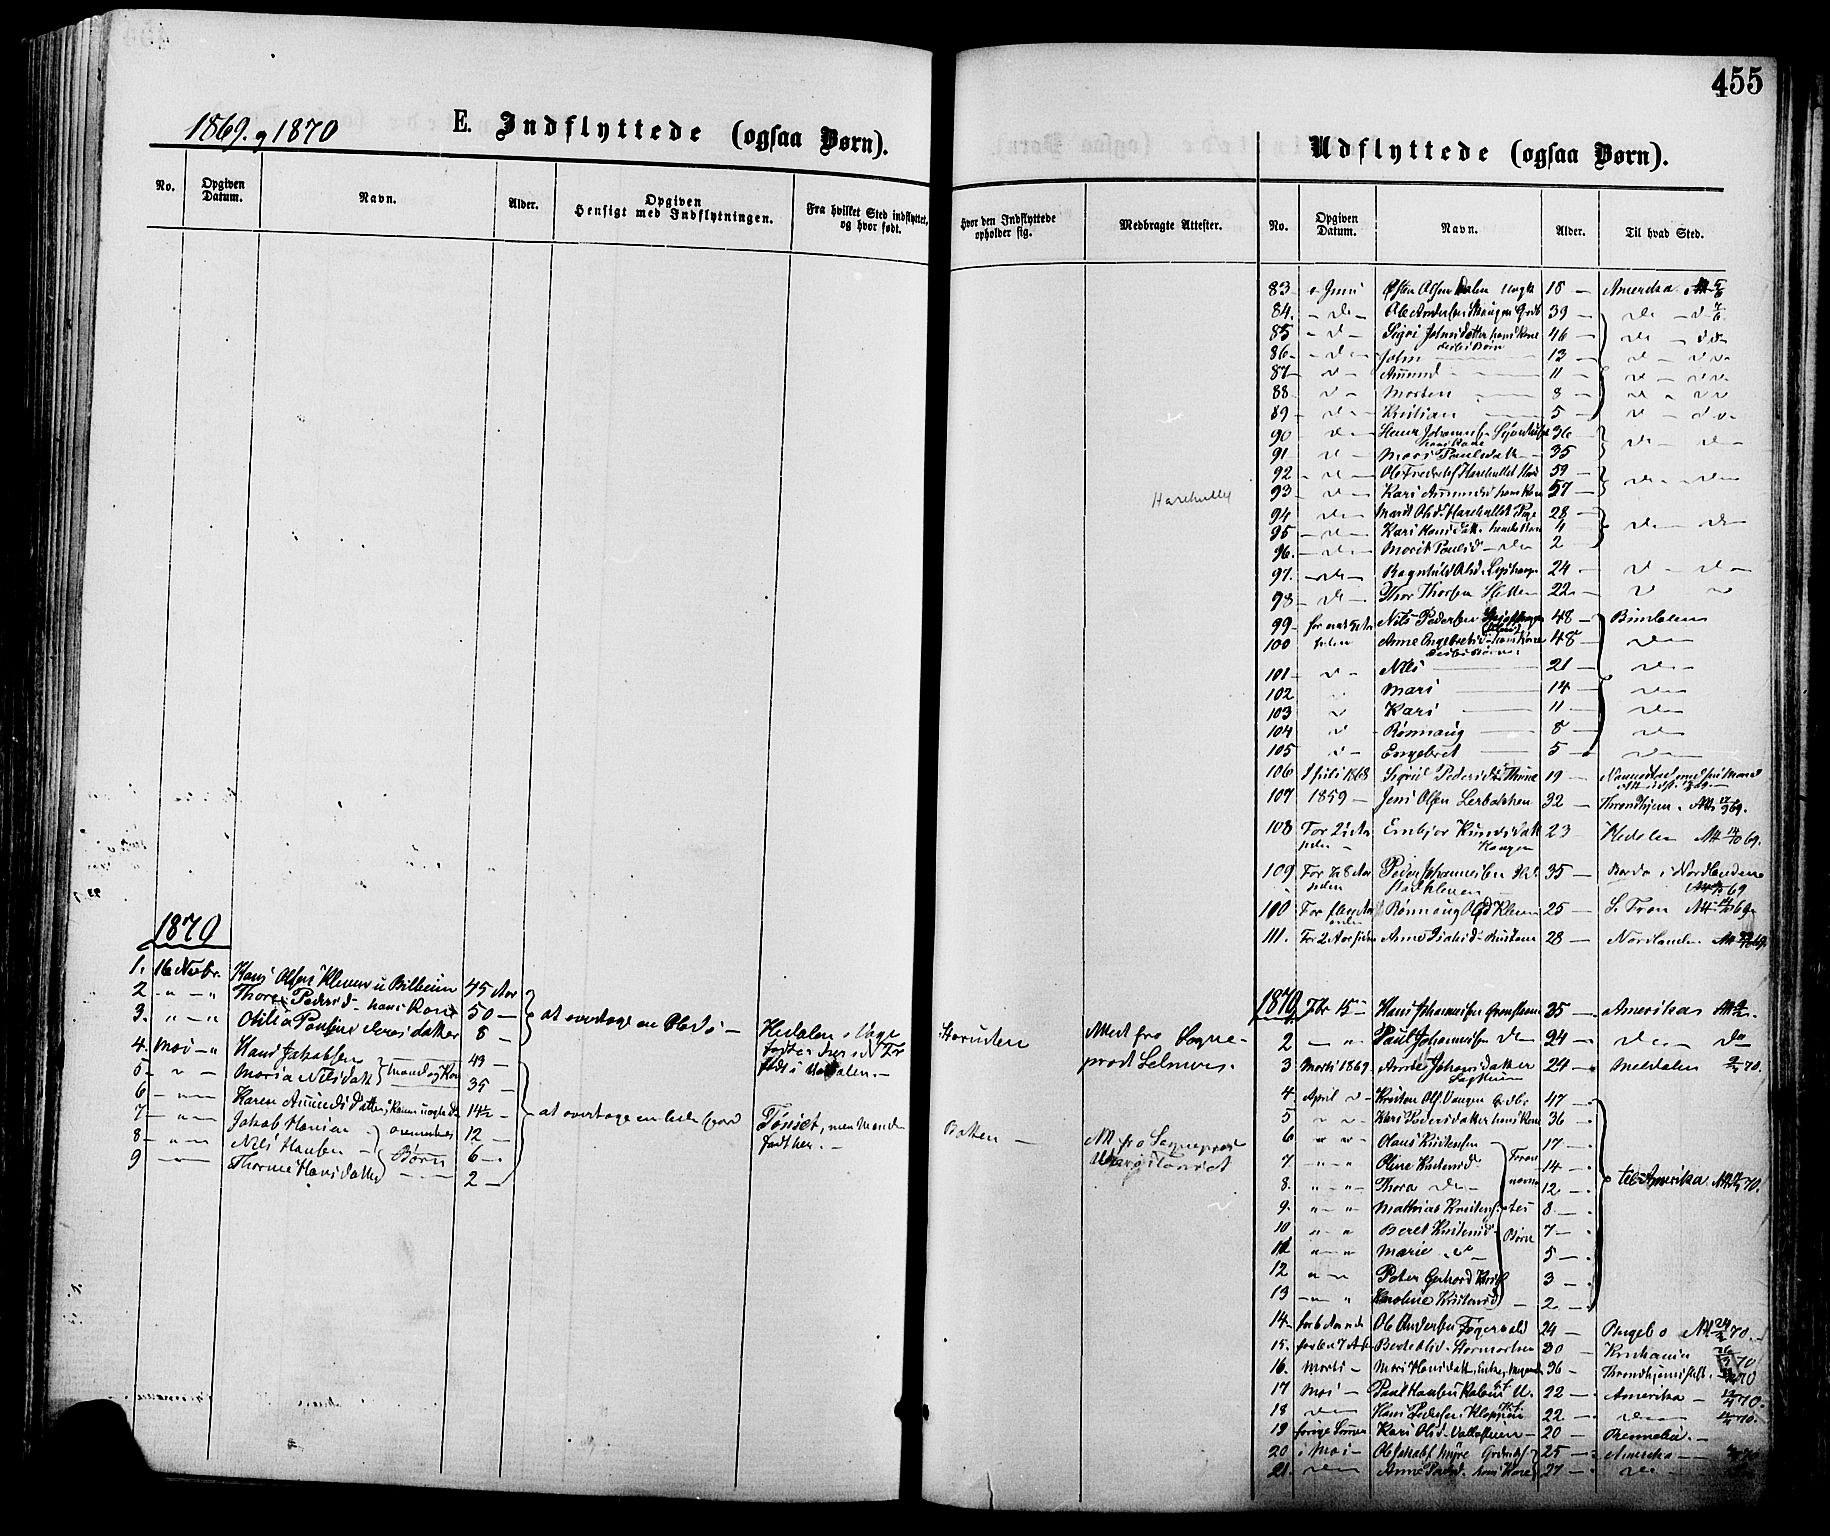 SAH, Nord-Fron prestekontor, Ministerialbok nr. 2, 1865-1883, s. 455